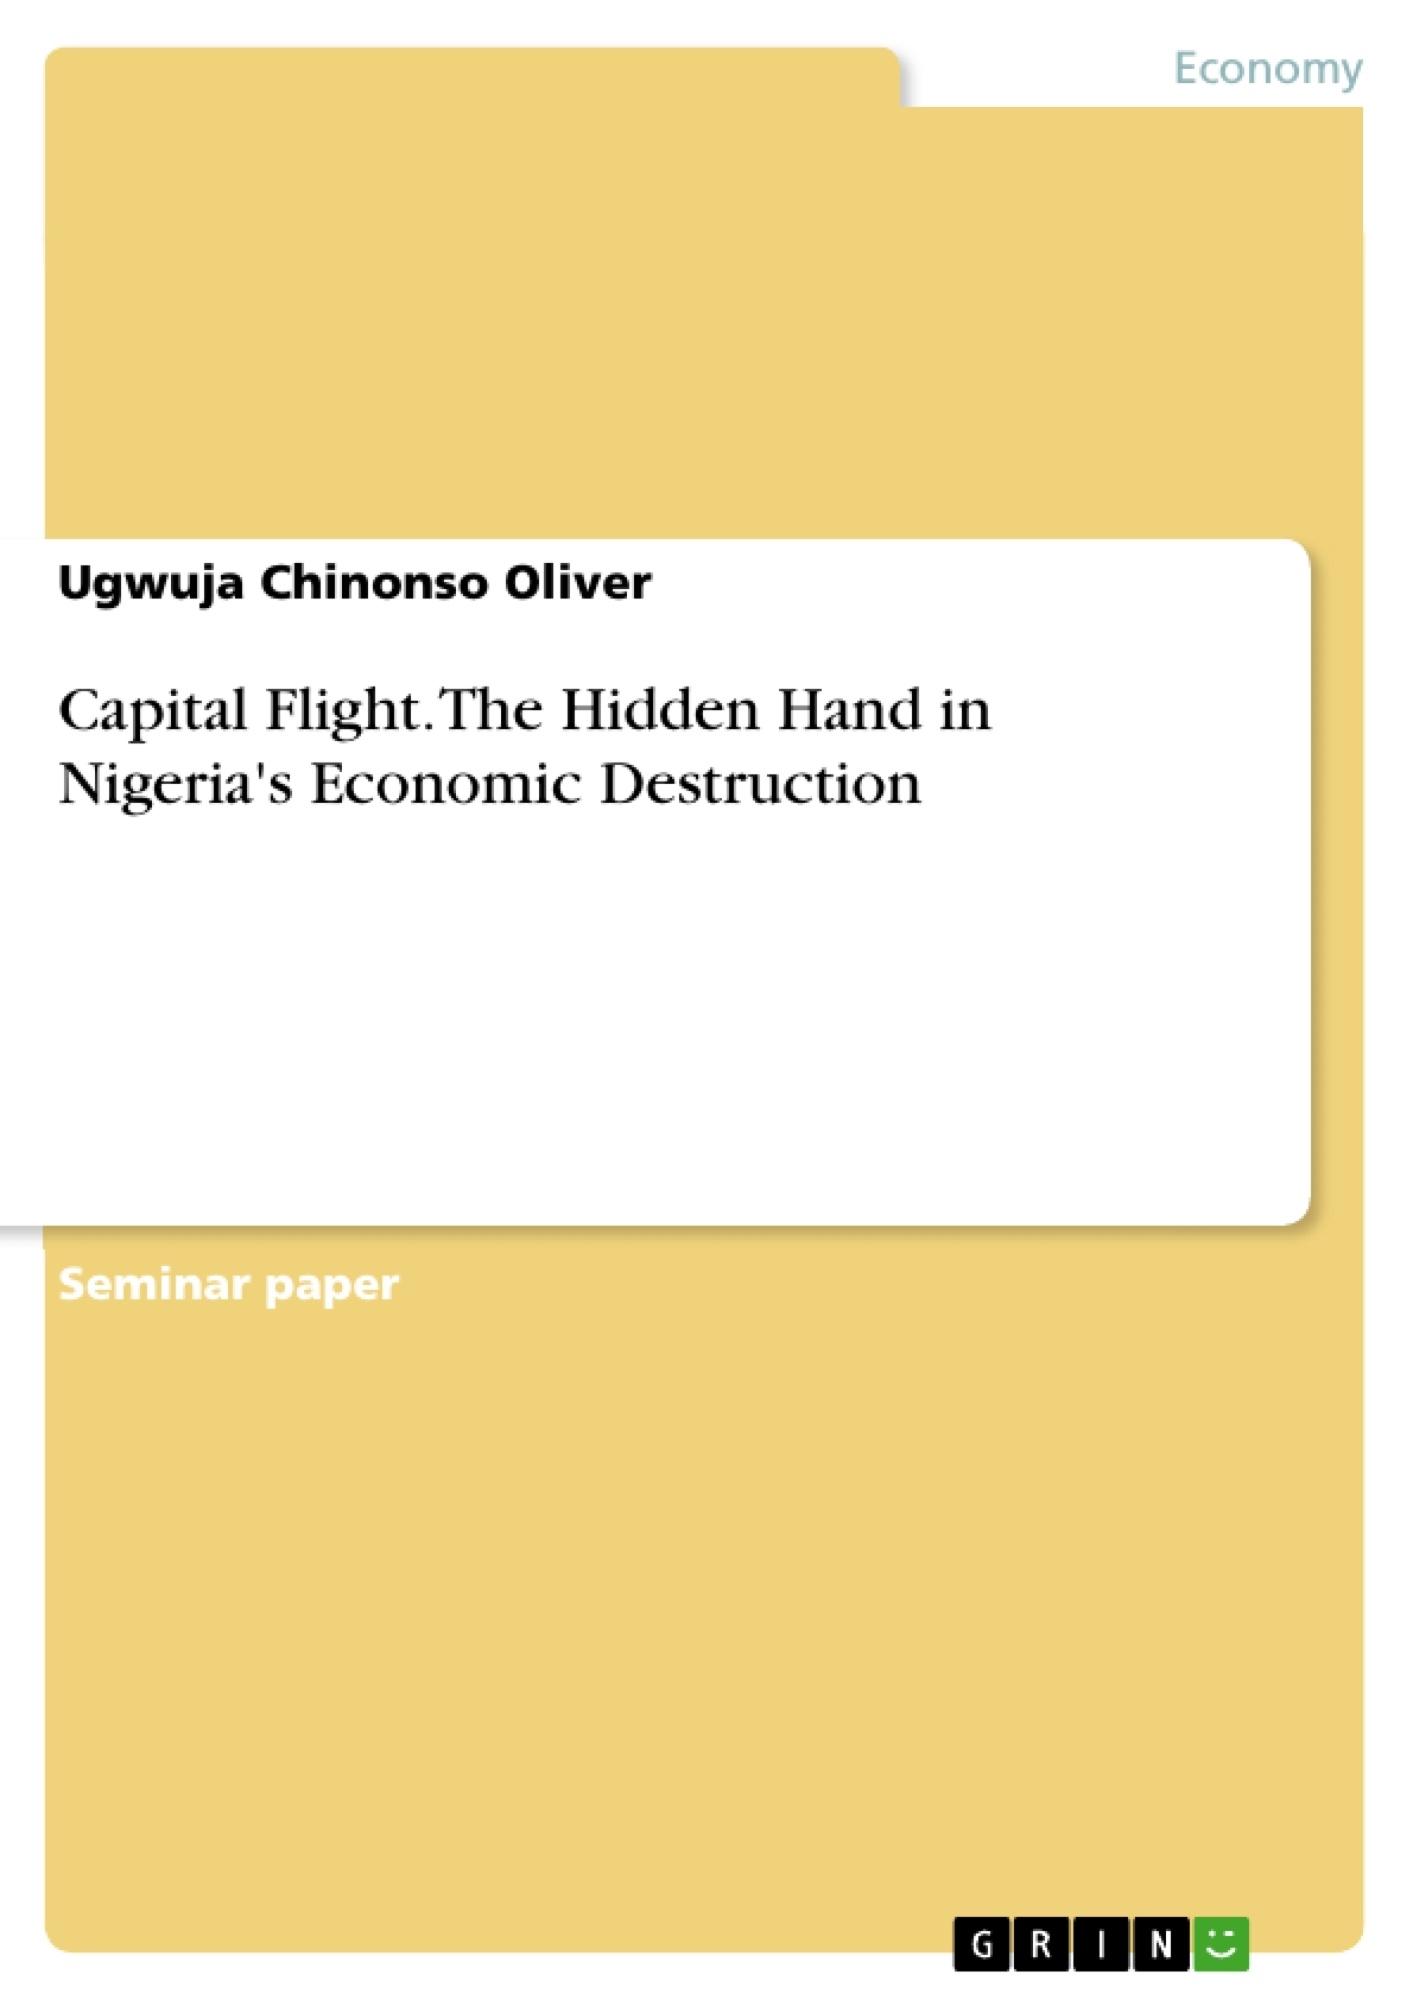 Title: Capital Flight. The Hidden Hand in Nigeria's Economic Destruction